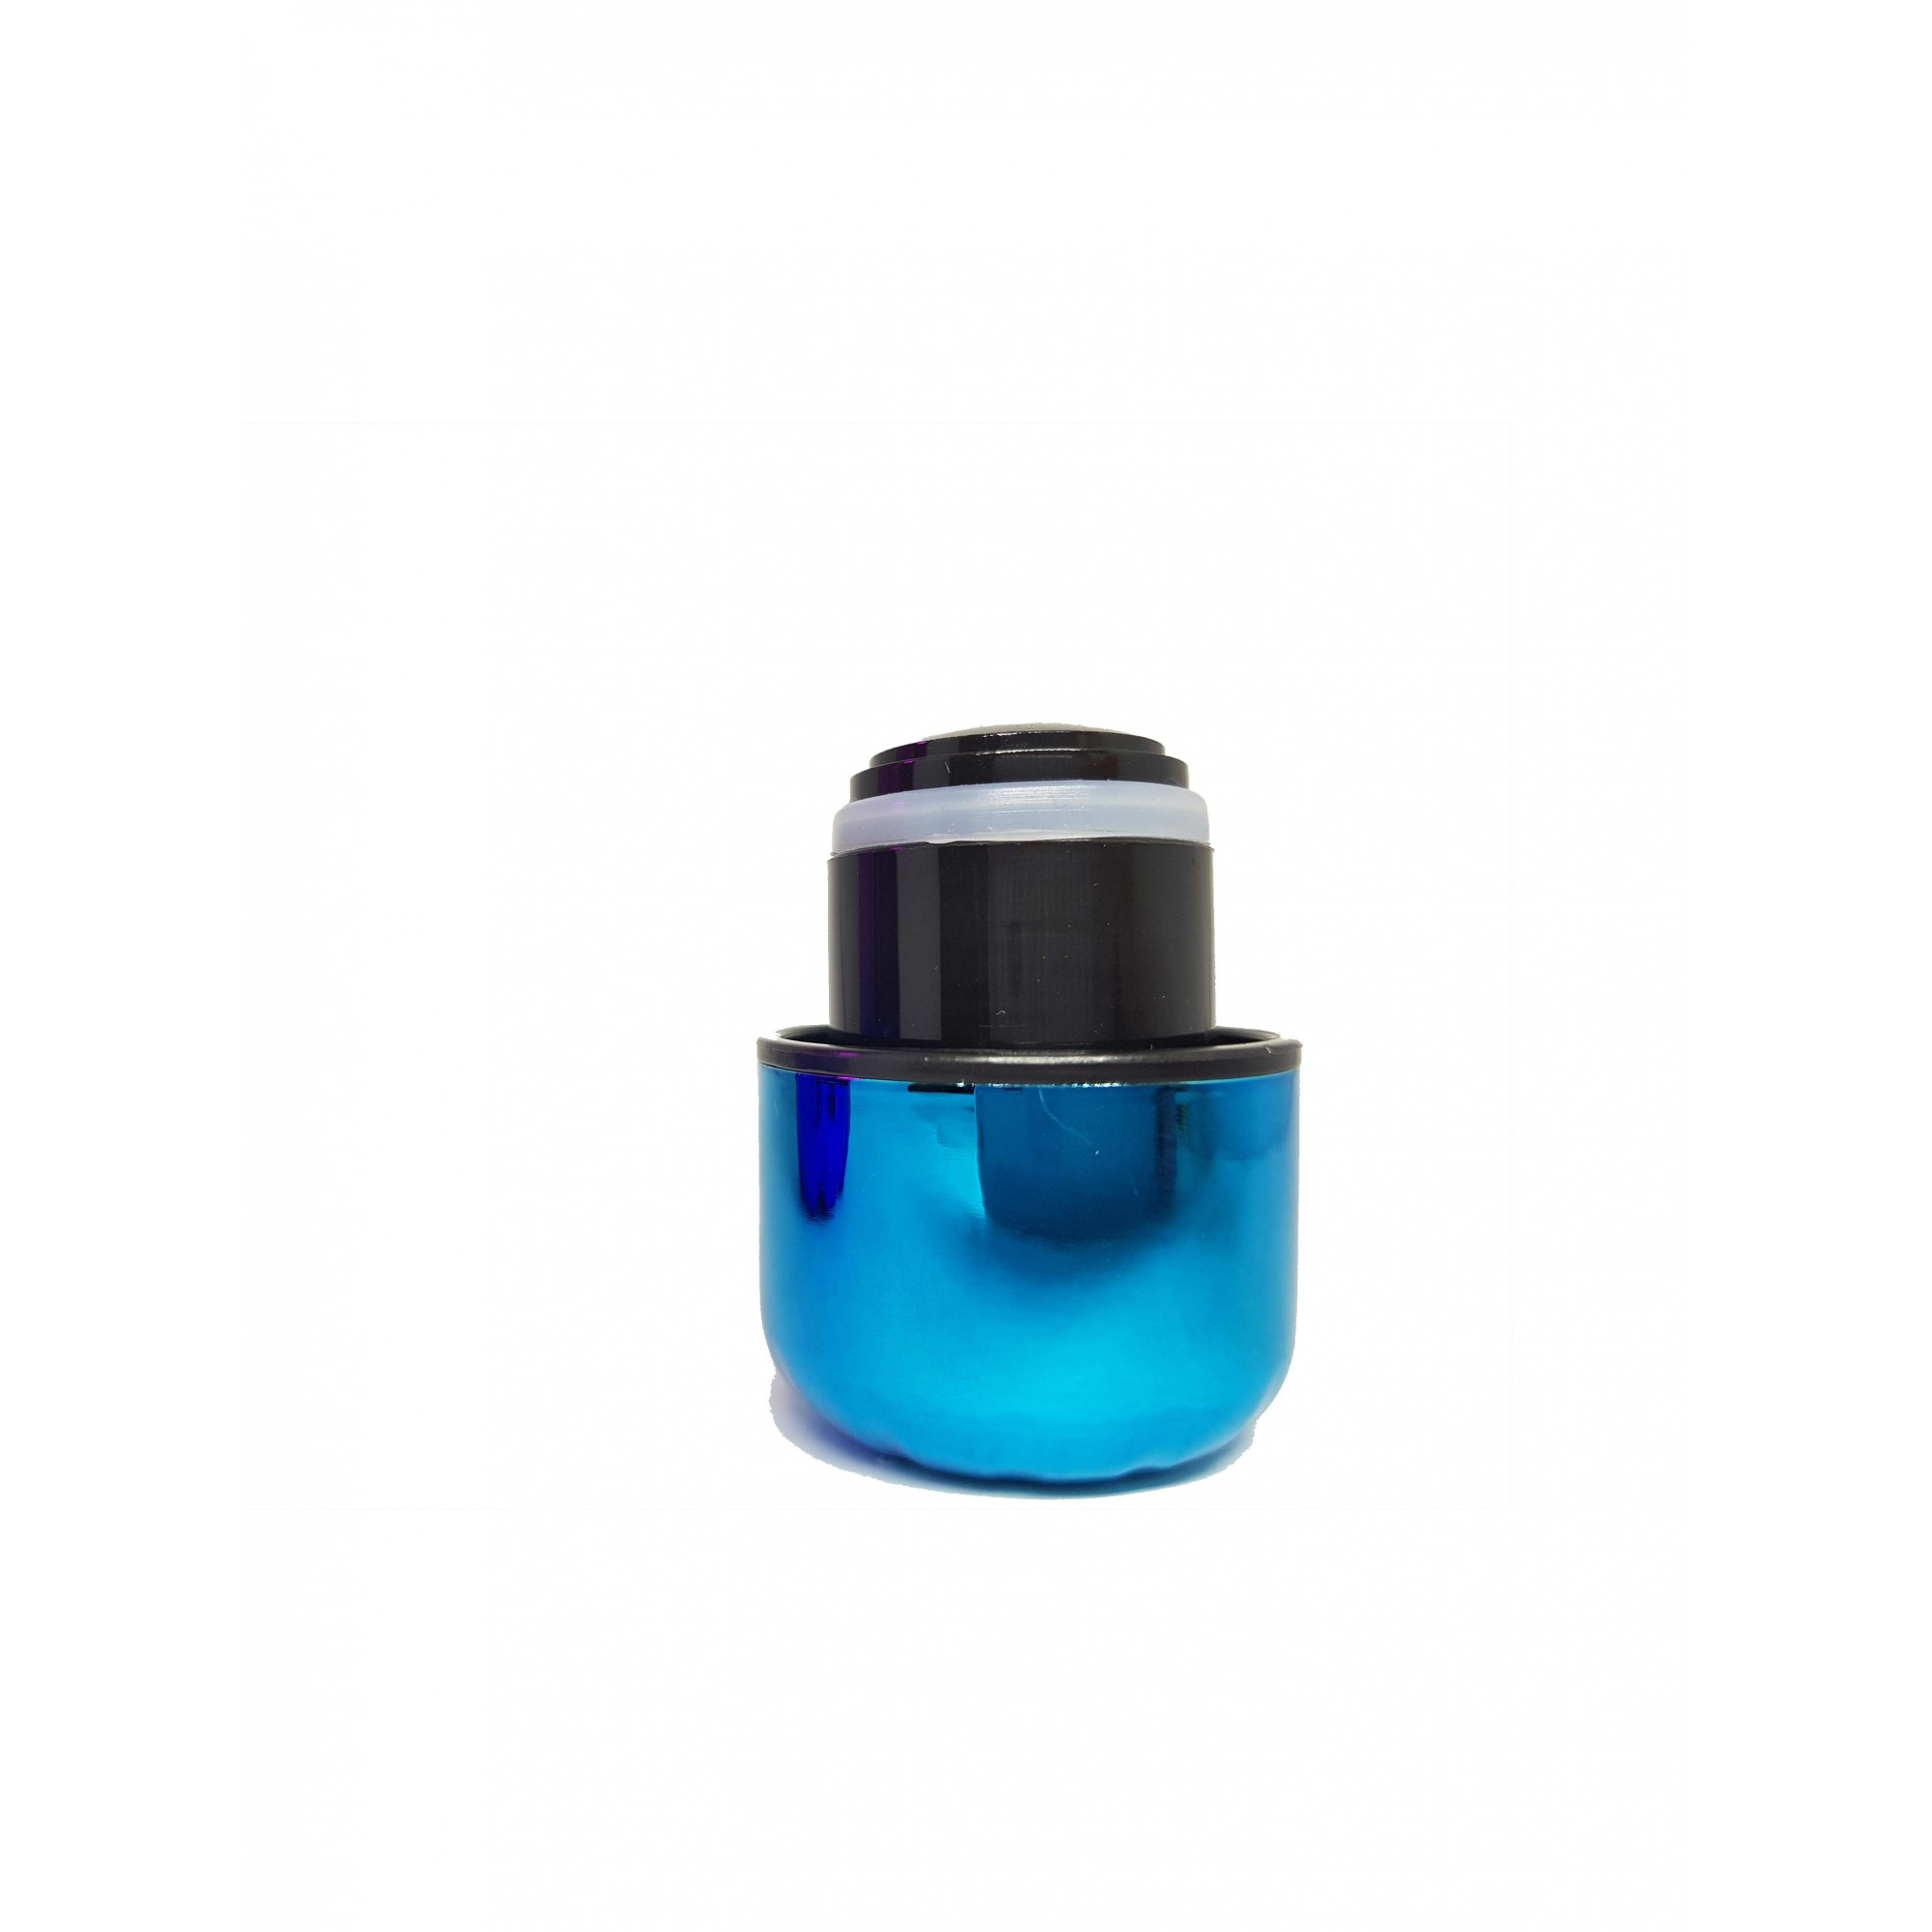 Kit Mundo Bolsa papel + garrafa Holográfica + kit 5 em 1 inox Preto